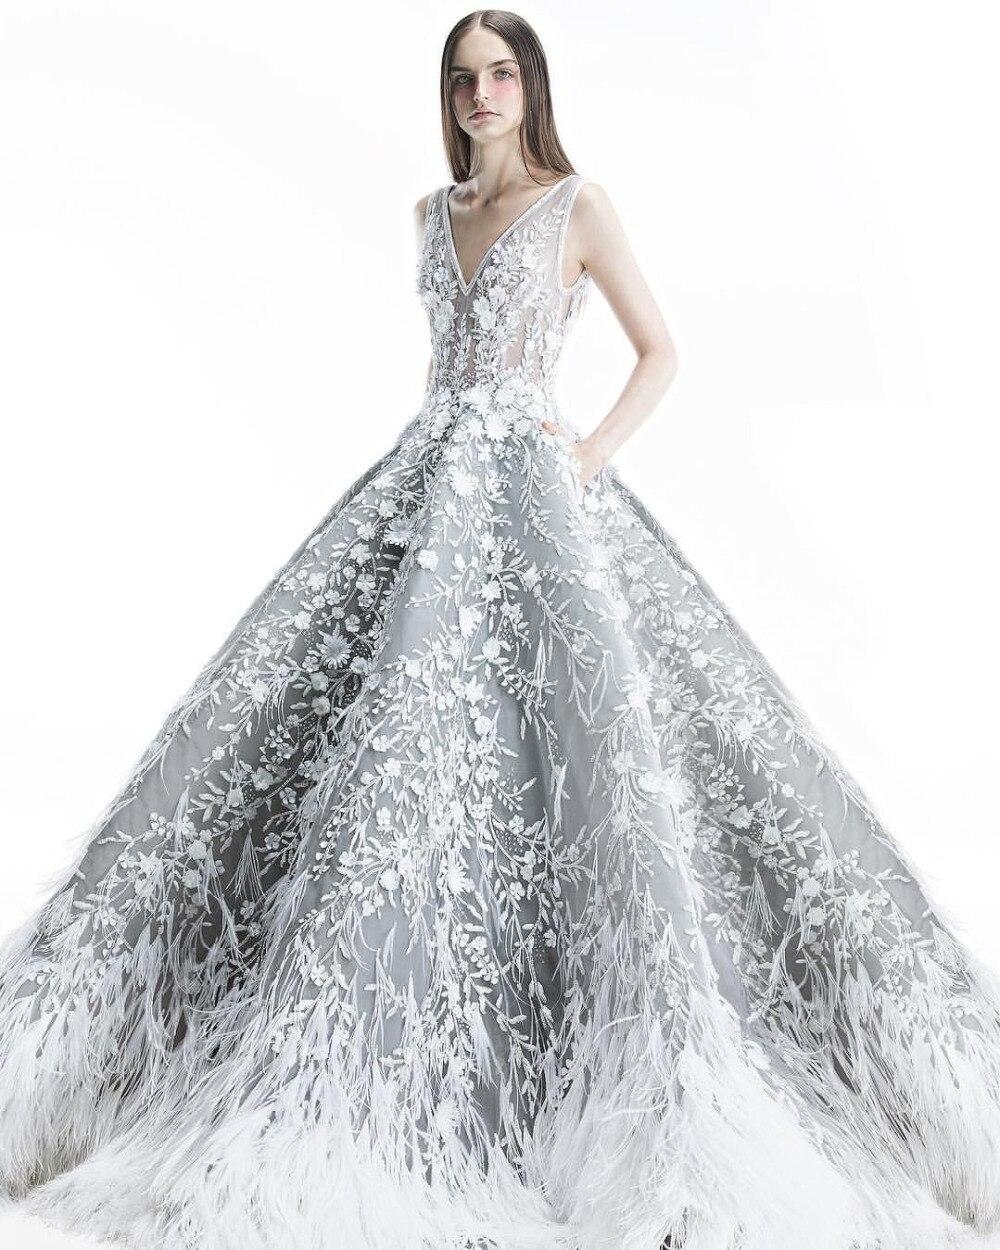 Eslieb Luxury Wedding Dress 2019 Feathers Wedding Dresses